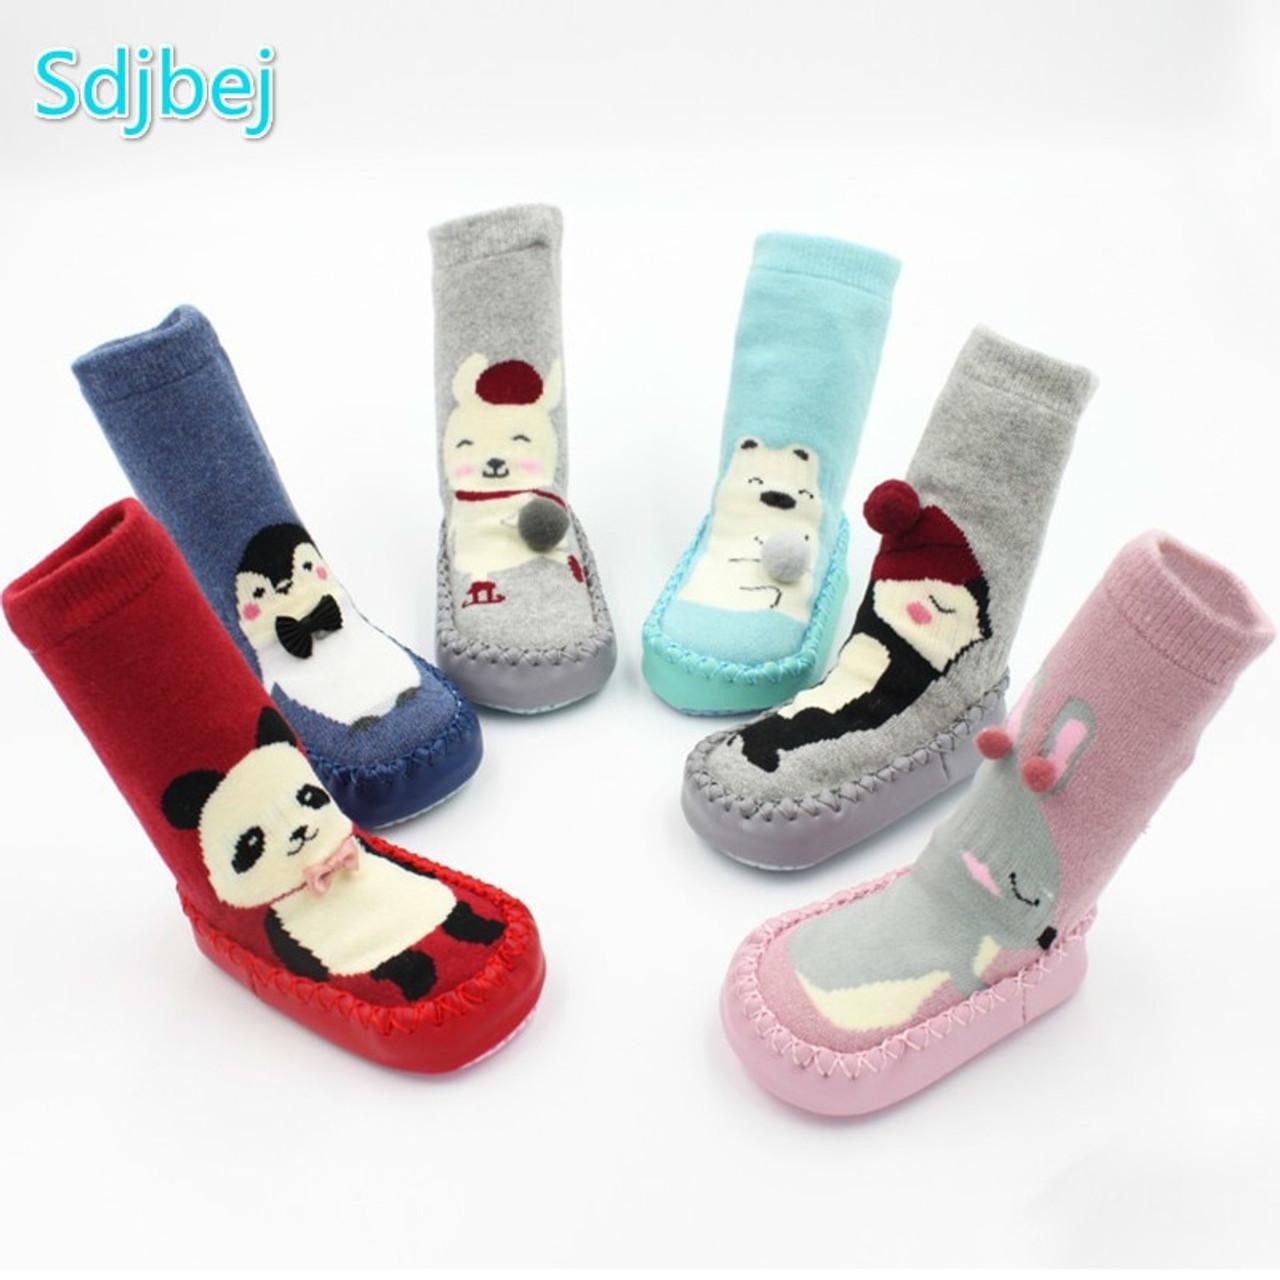 Baby Socks,amazingdeal Kids Thicken Winer Penguin Pattern Pink Warm Antiskid Socks